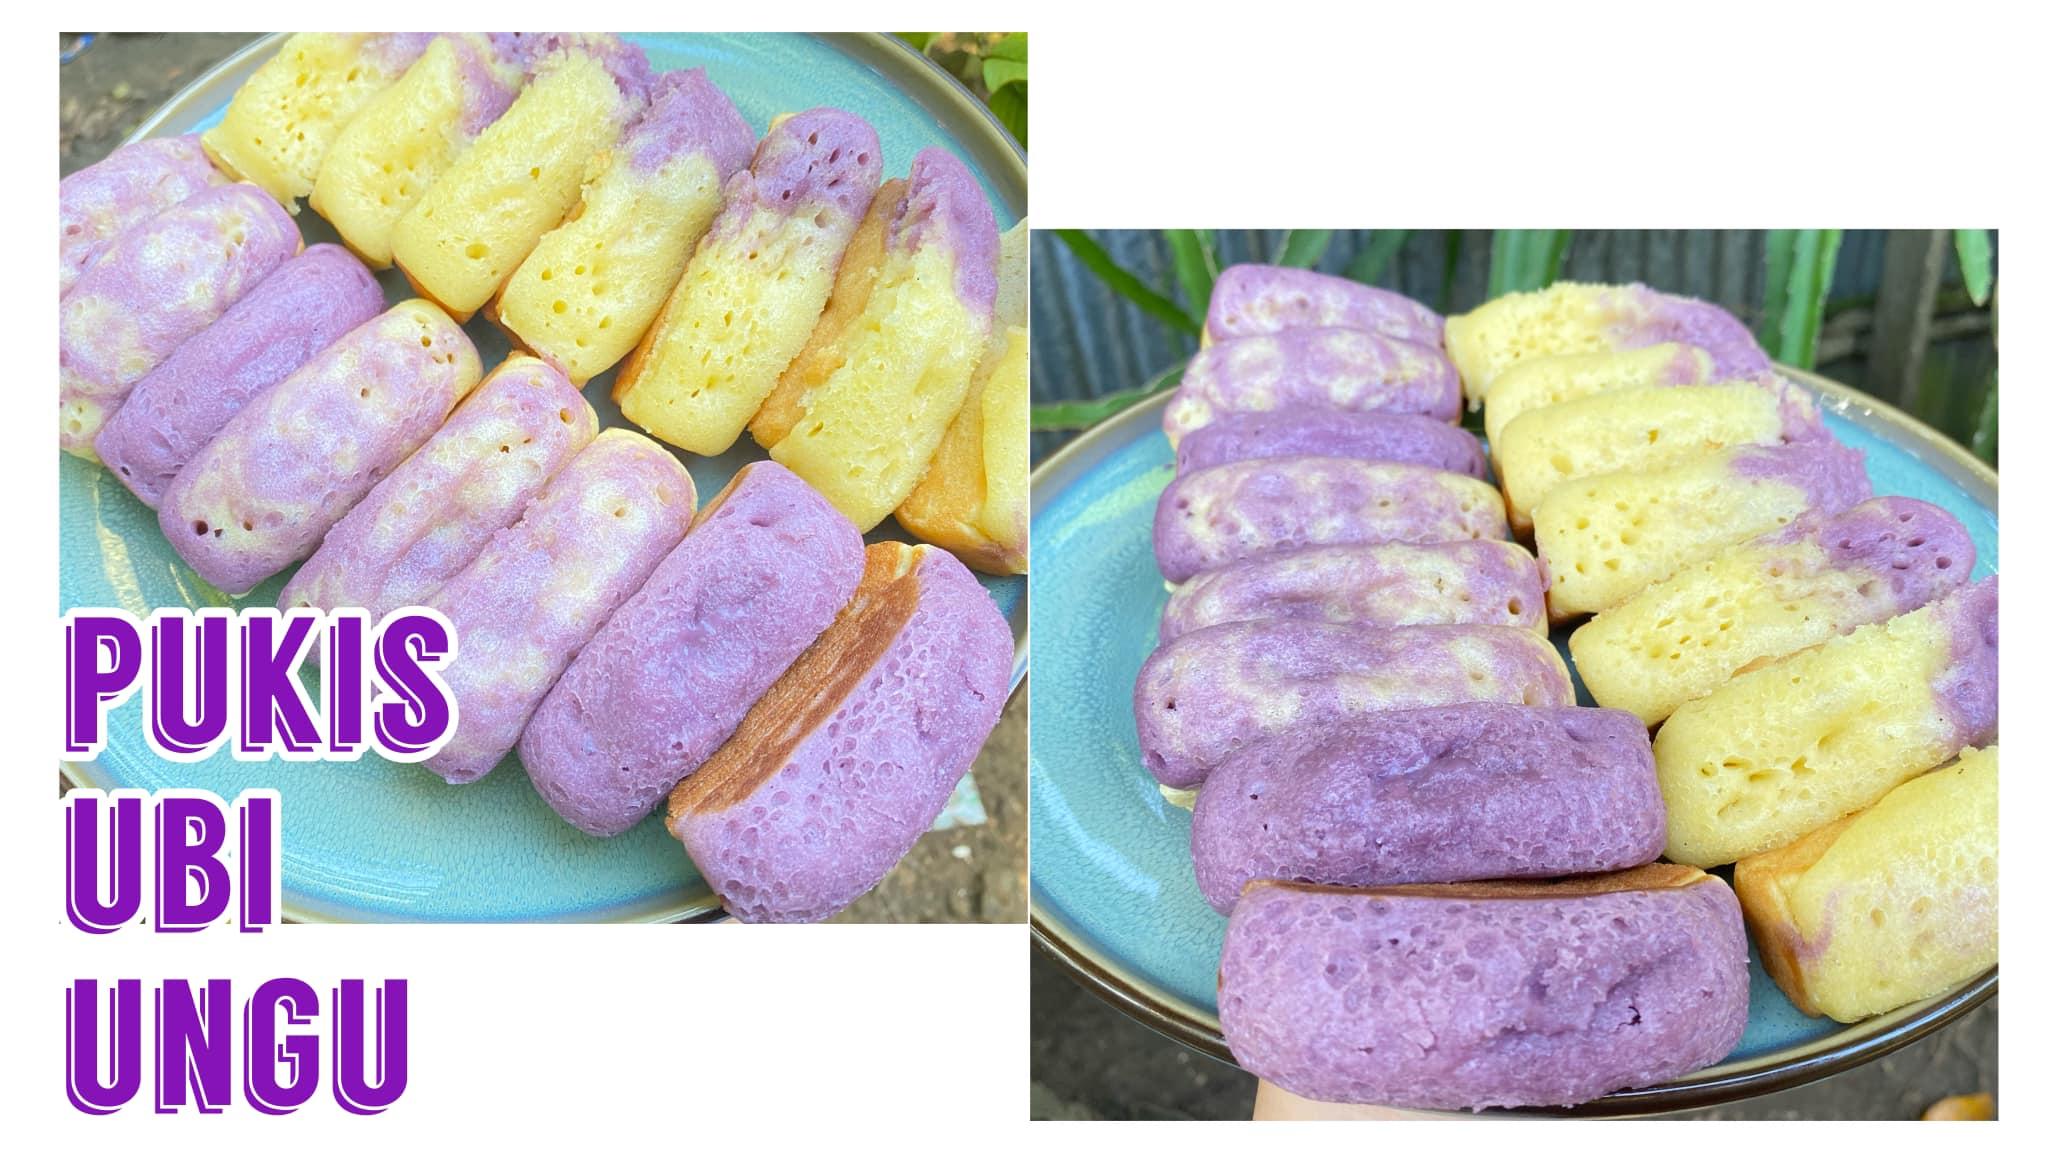 PUKIS ubi ungu super lembut by Fitriatul Muniroh